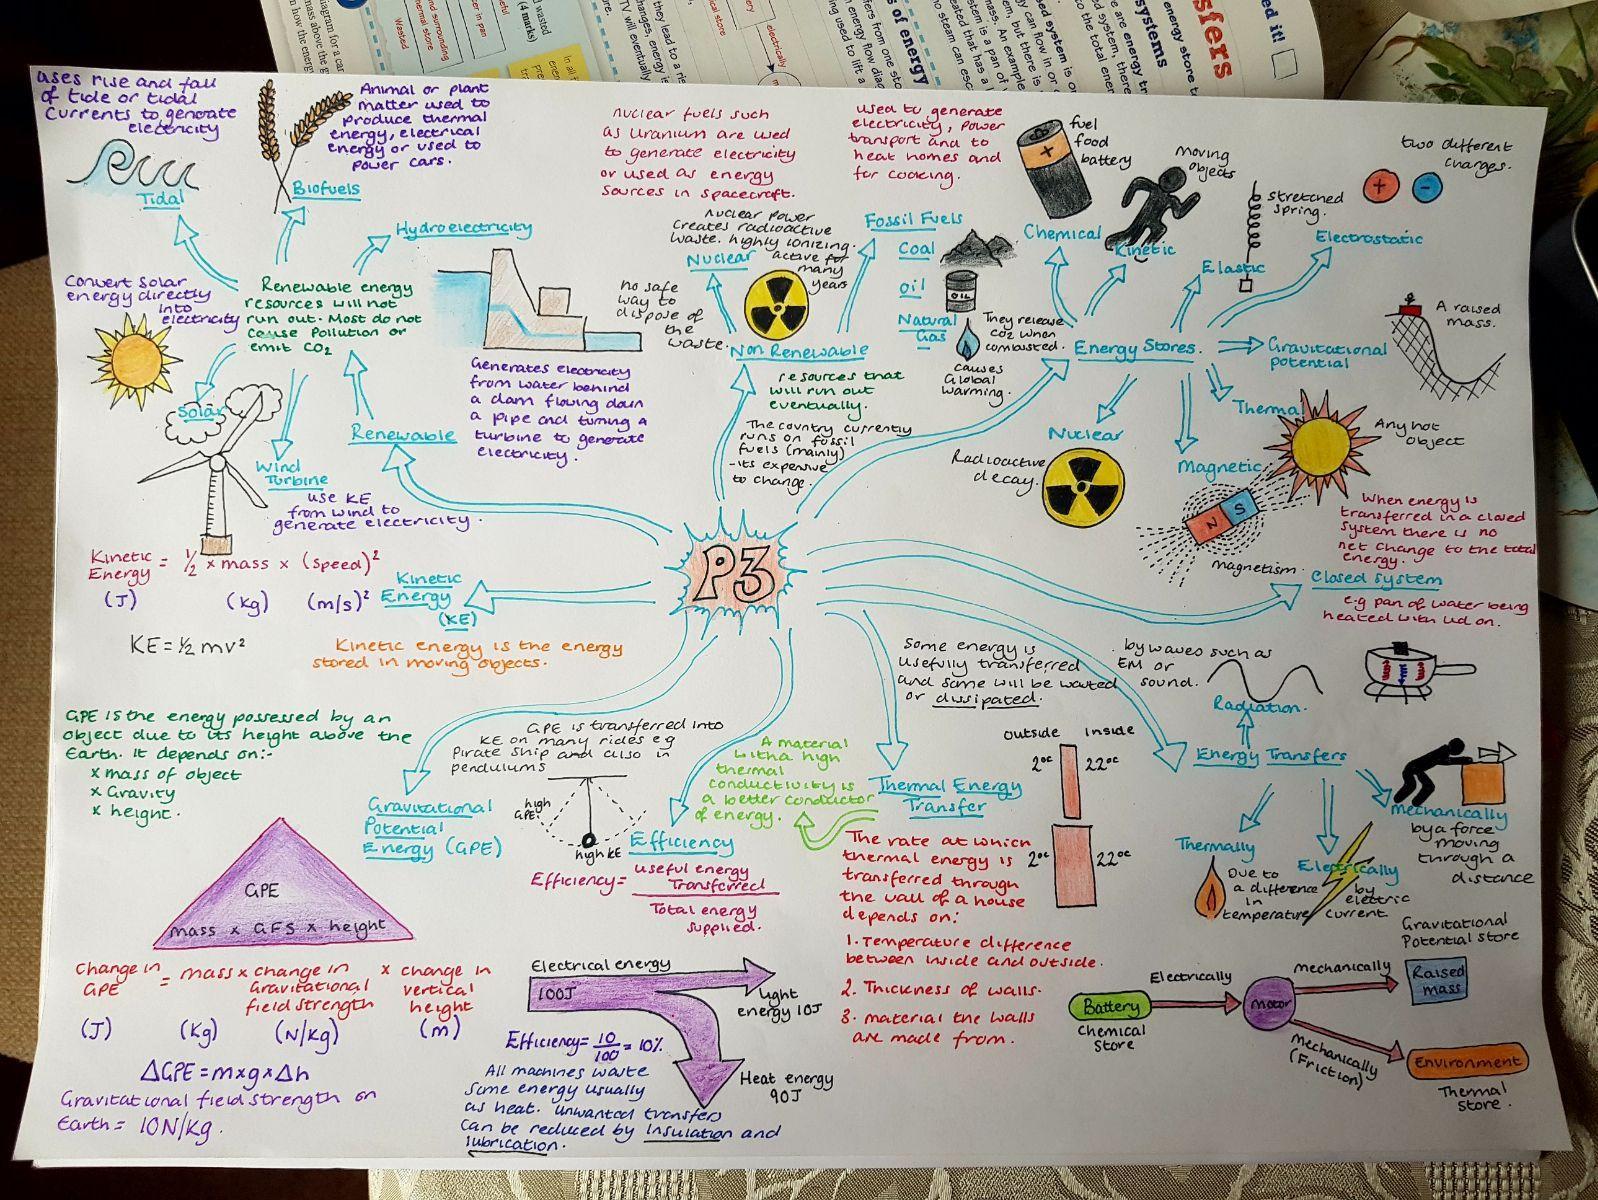 Revision MindMaps, Edexcel Combined Physics Paper 1